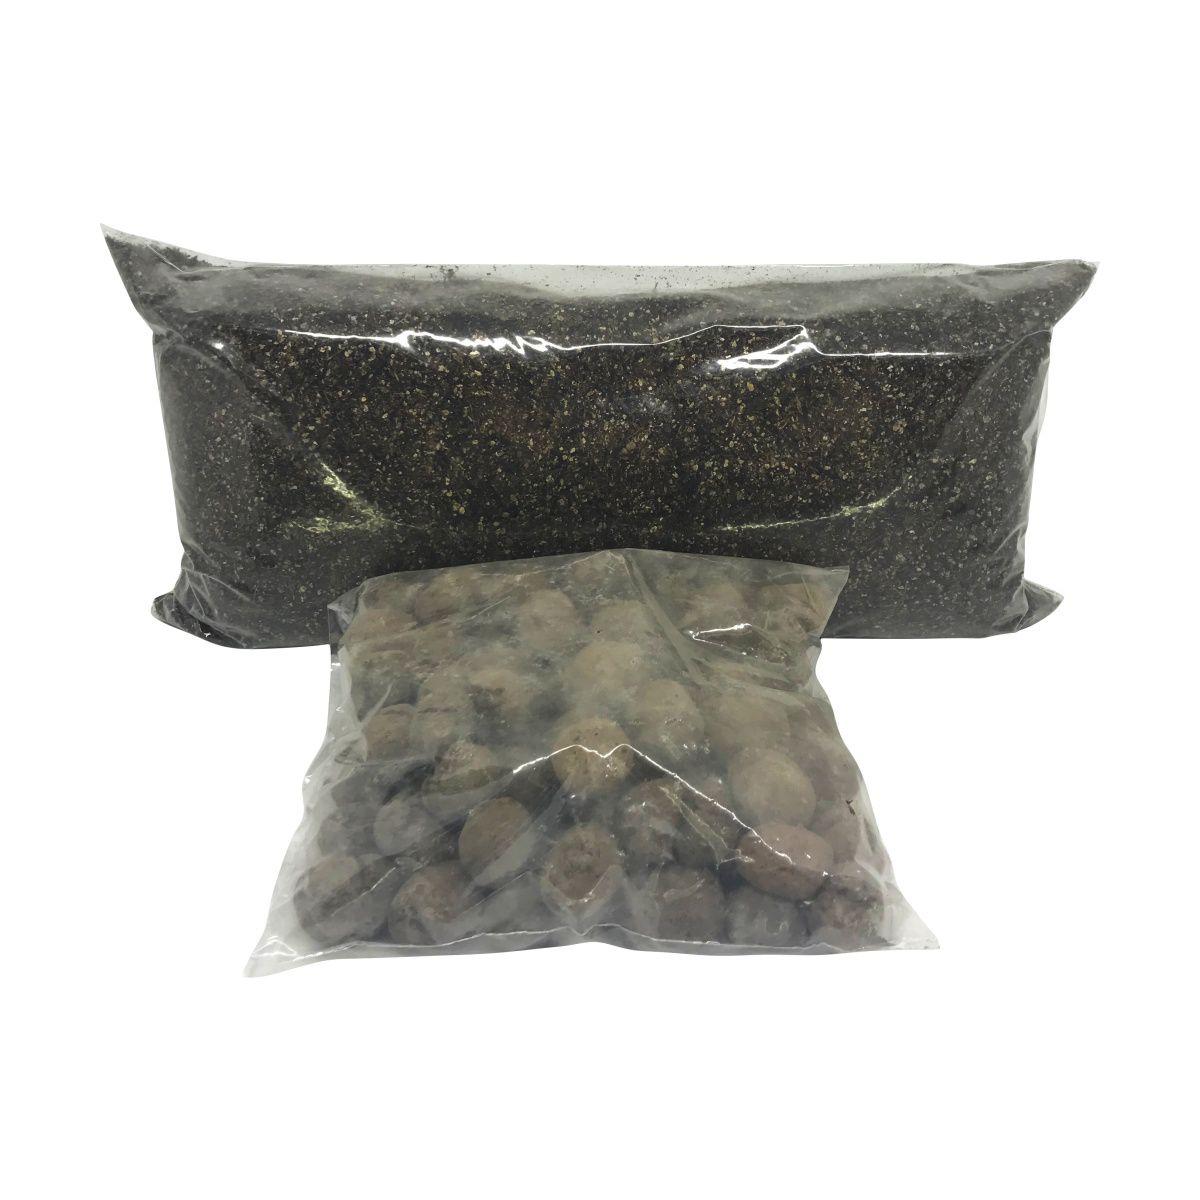 Kit Substrato para Vaso Autoirrigável Jardineira Raiz + Argila Expandida